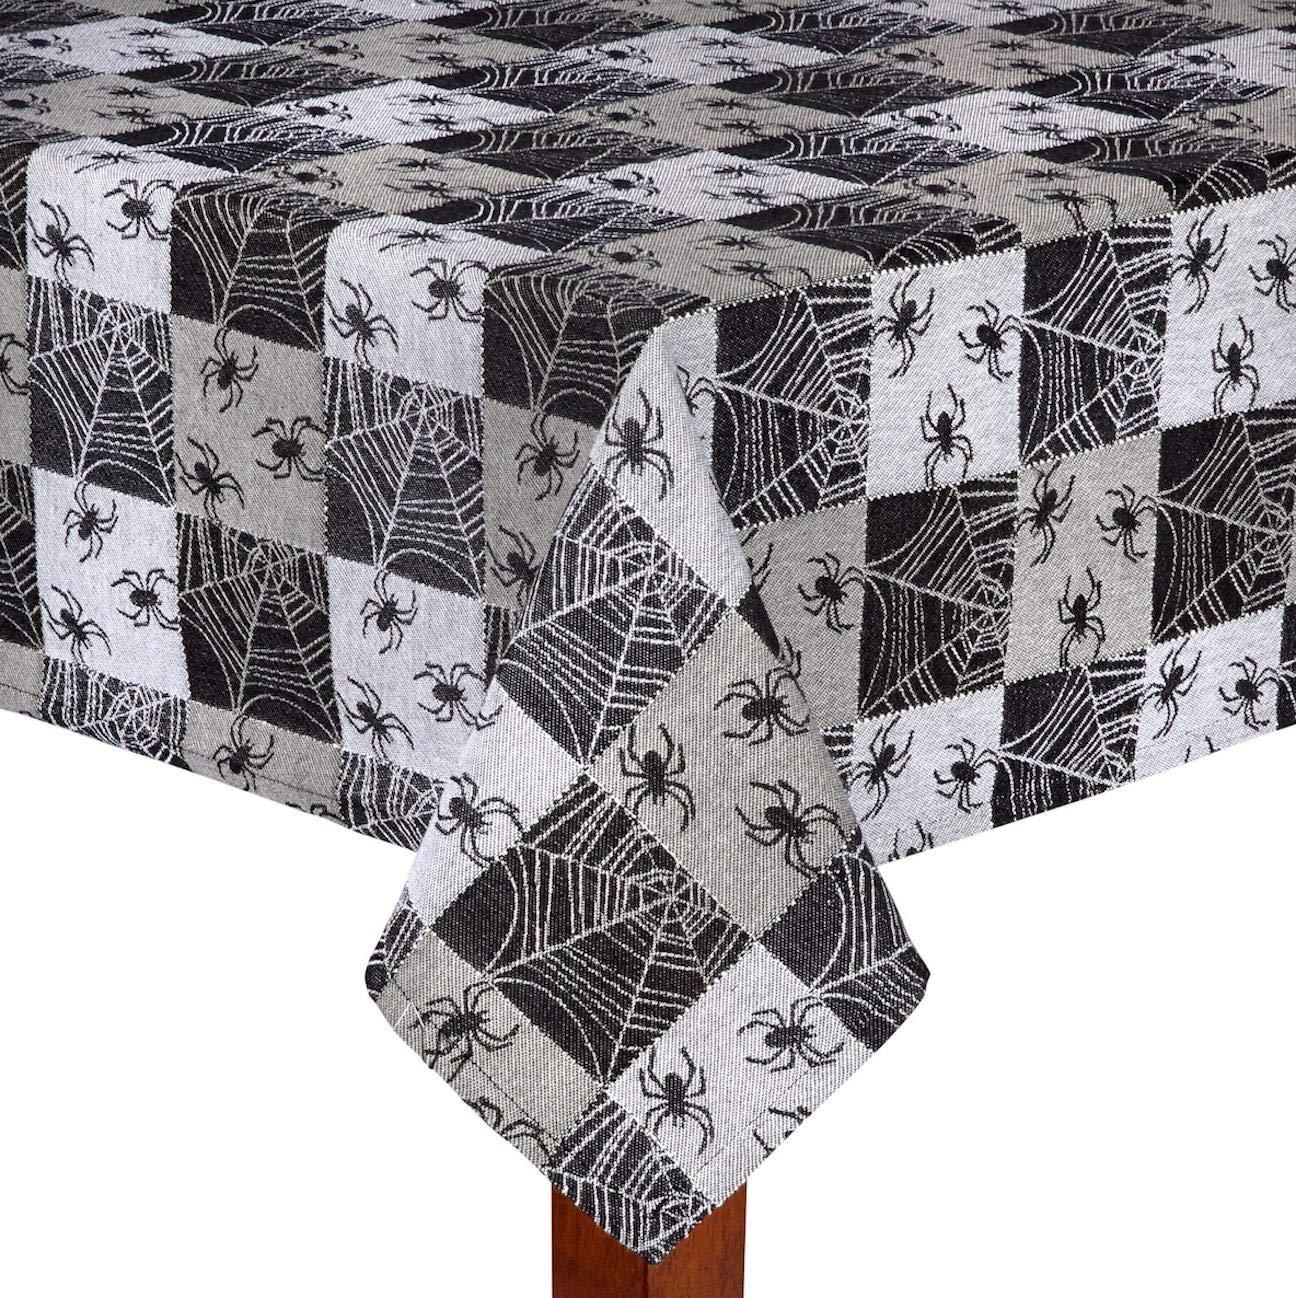 Nantucket Home Black Checkered Spider Web Cotton Fabric Jacquard Halloween Tablecloth (60' Round)